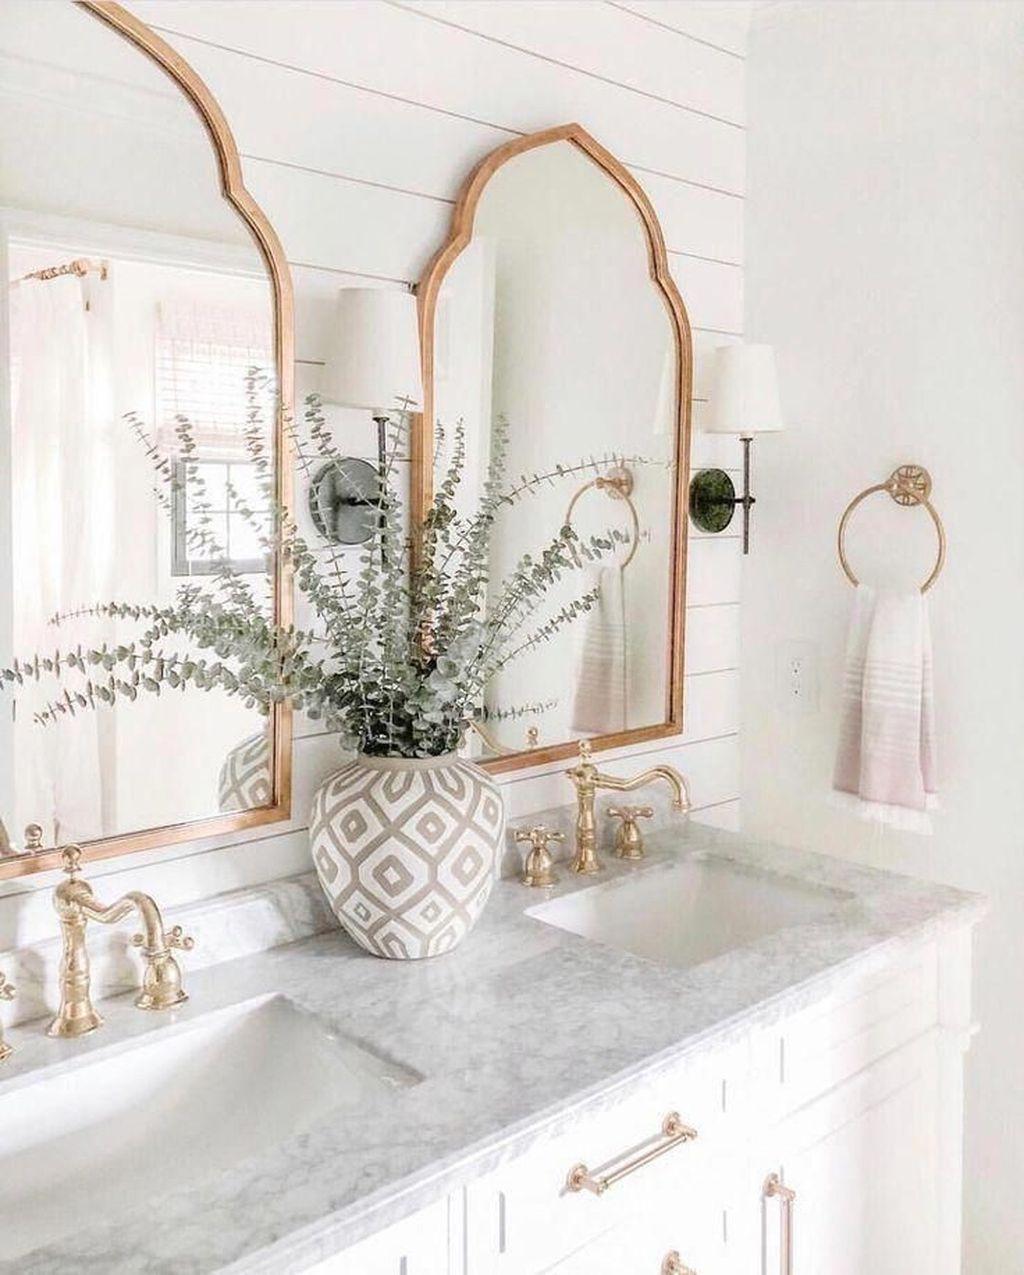 Admirable Rustic Modern Bathroom Design And Decor Ideas 02